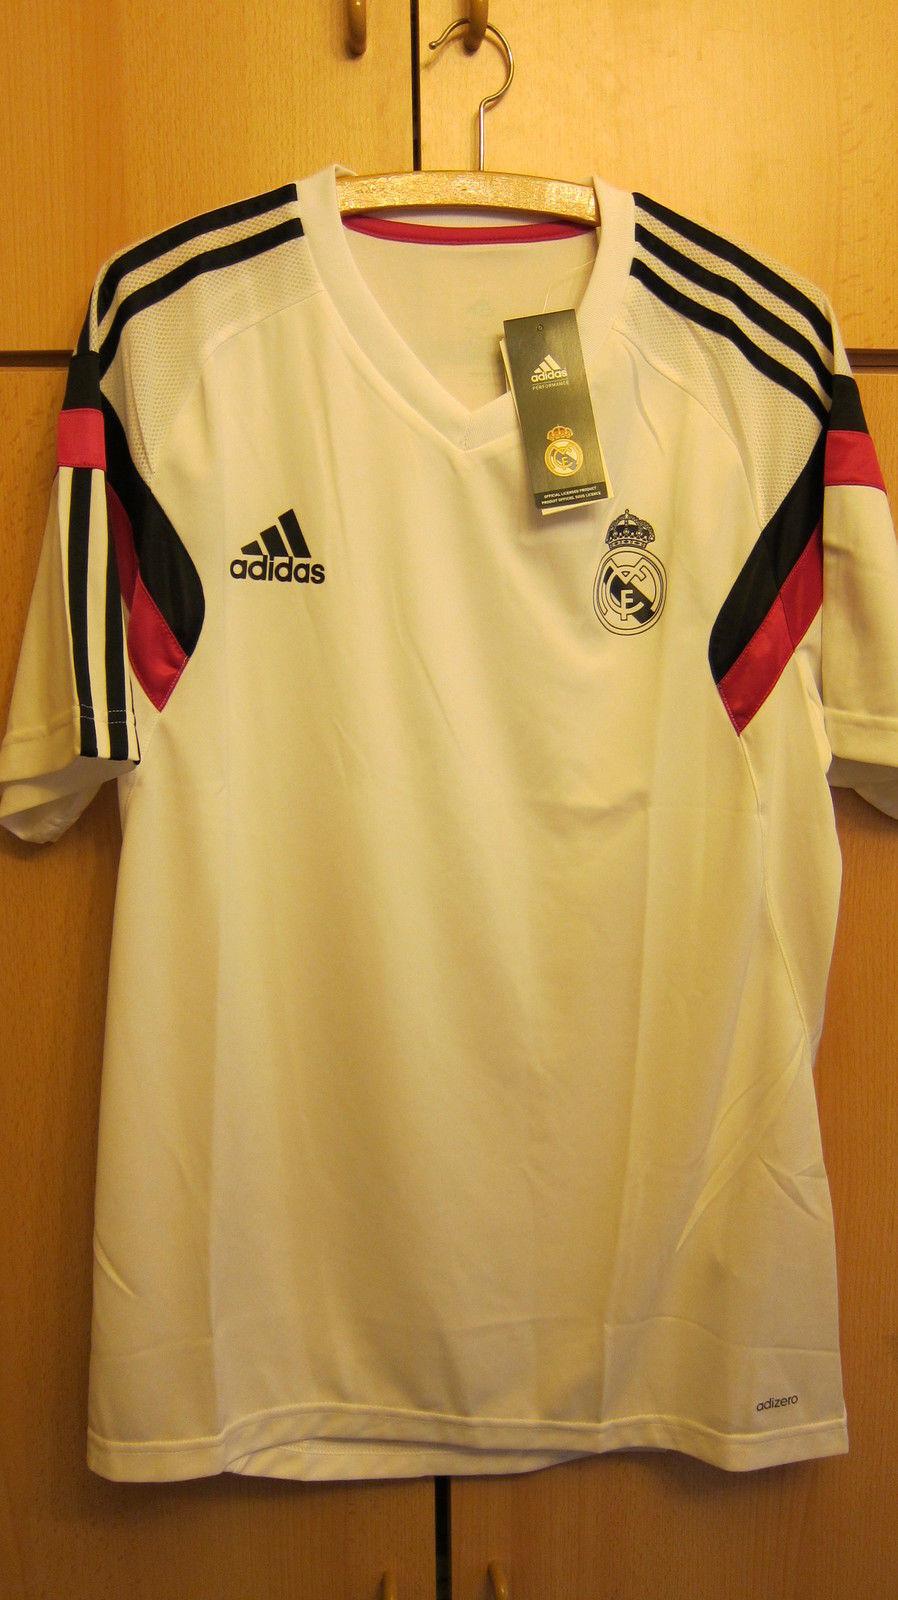 Neu,Adidas Real Madrid Gr L Trikot,AdiZero,Spanien,Jersey,Camiseta,Maggie,maillot